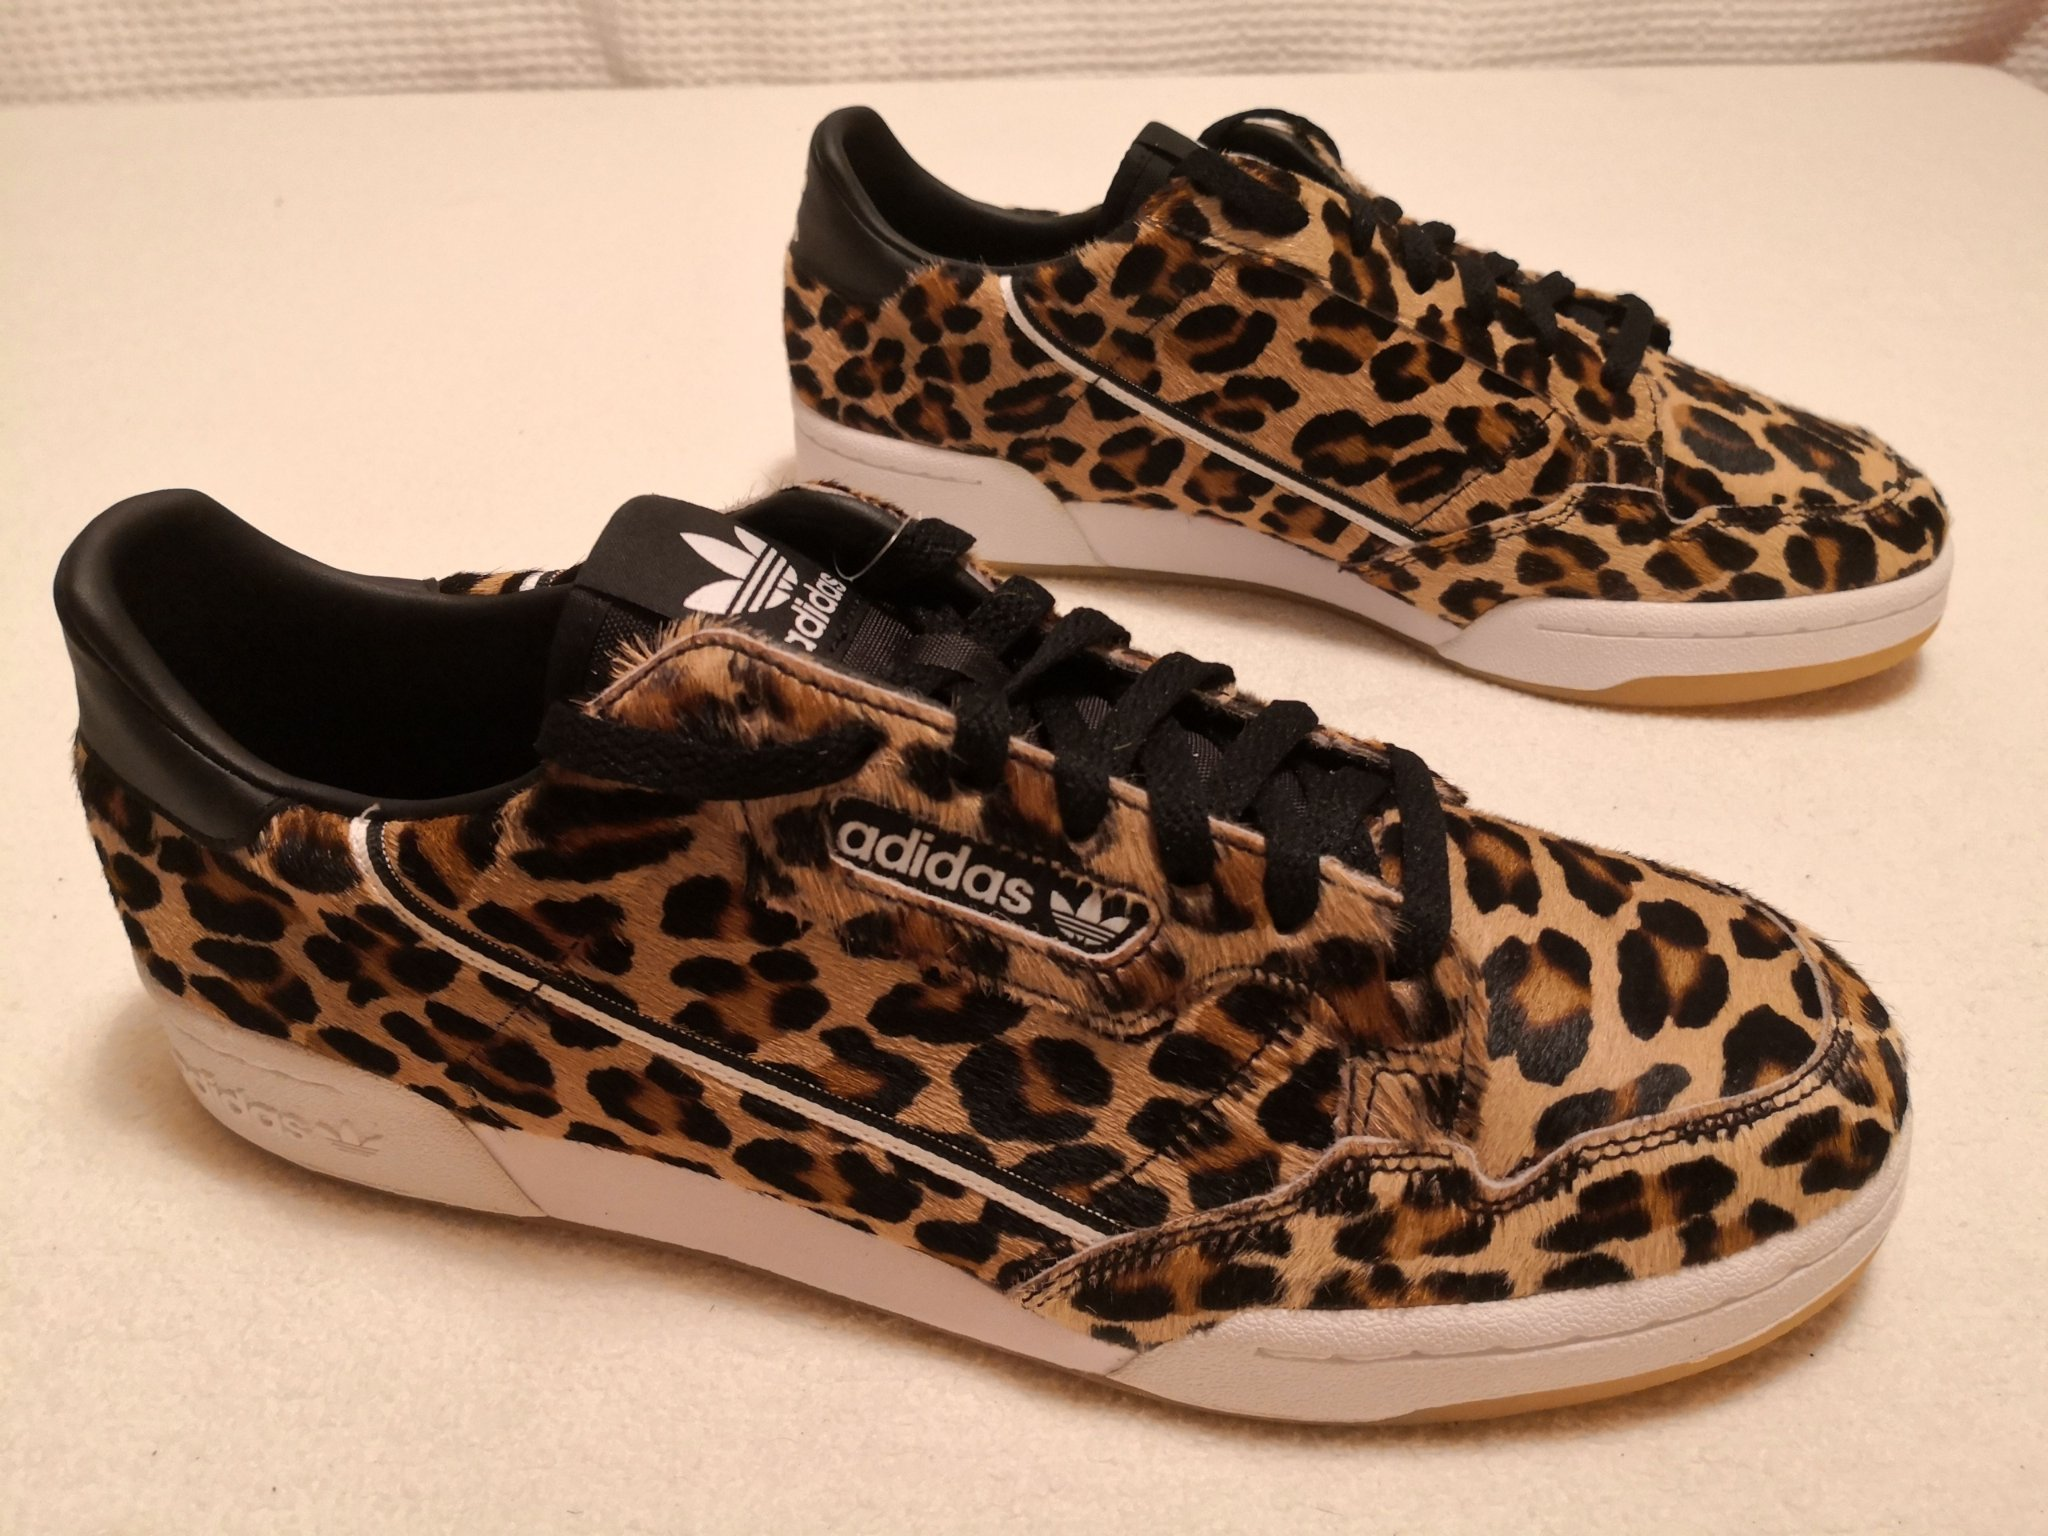 New Adidas Continental 80 Leopard New Adidas Continental 80